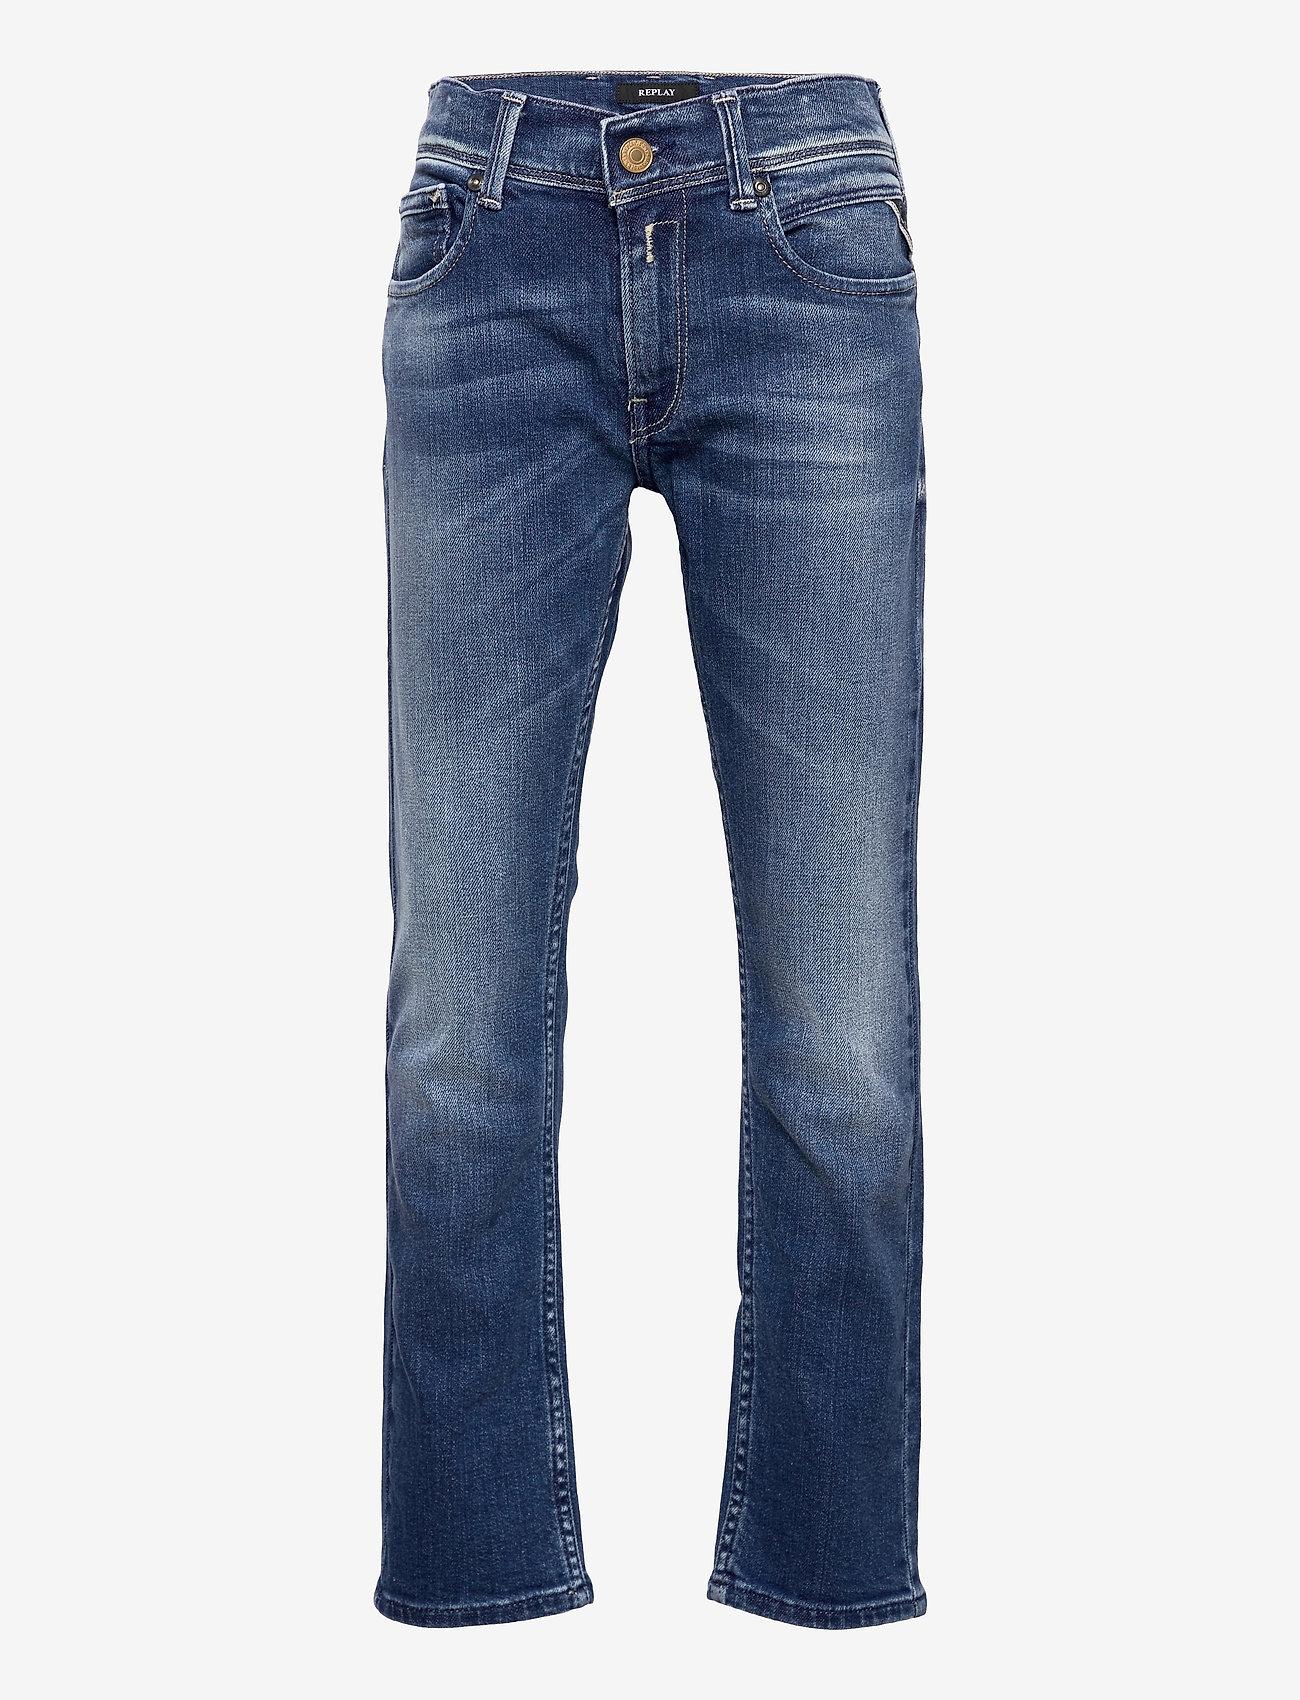 Replay - NEILL - jeans - denim - 0